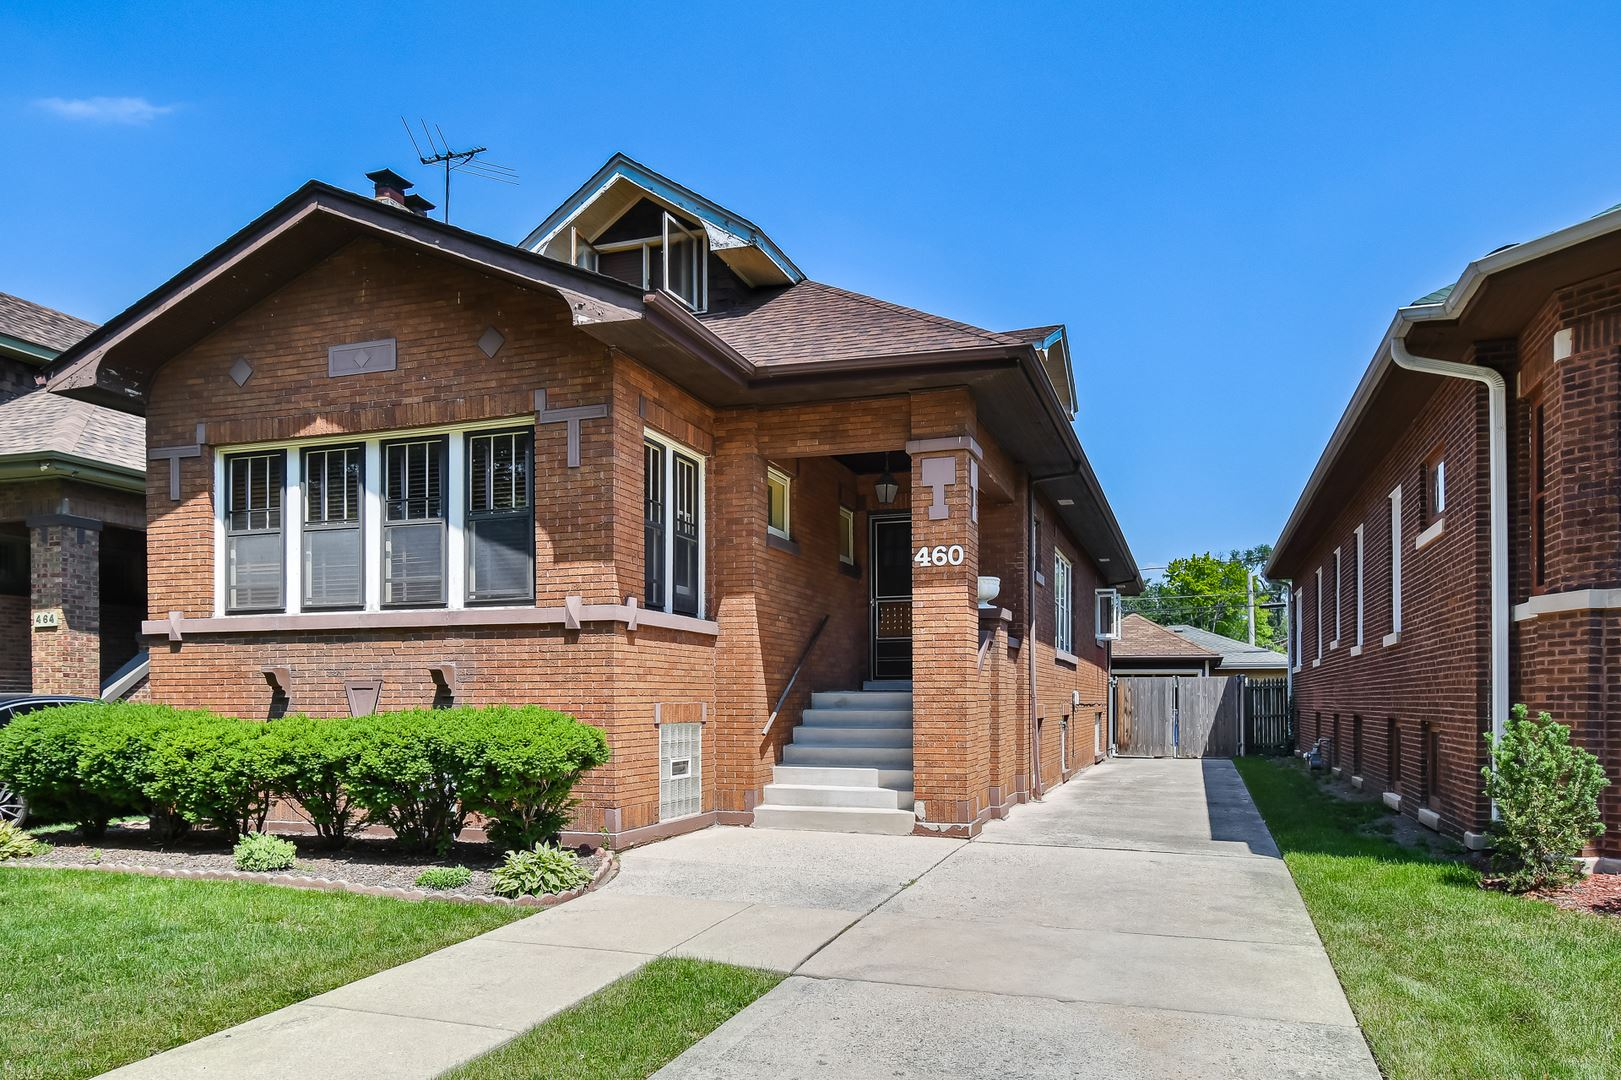 460 Lenox Street, Oak Park, IL 60302 - #: 11223713